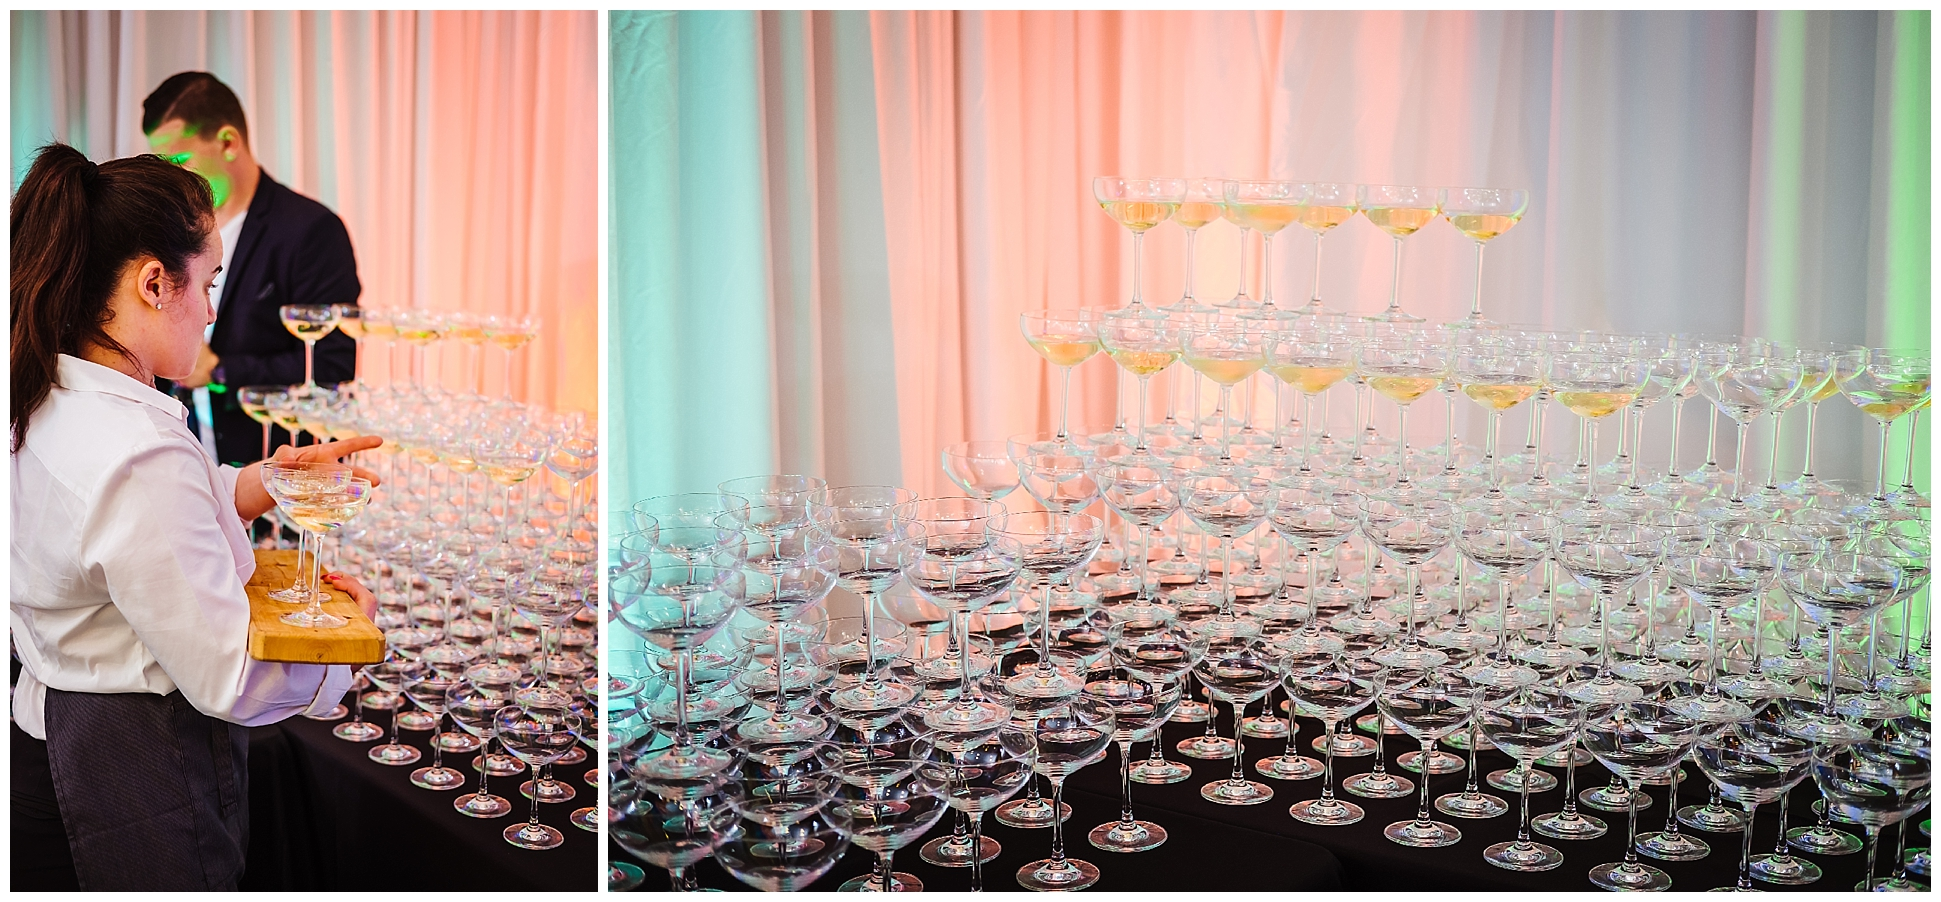 salt block catering-fun-bright-colorful-event_0002.jpg